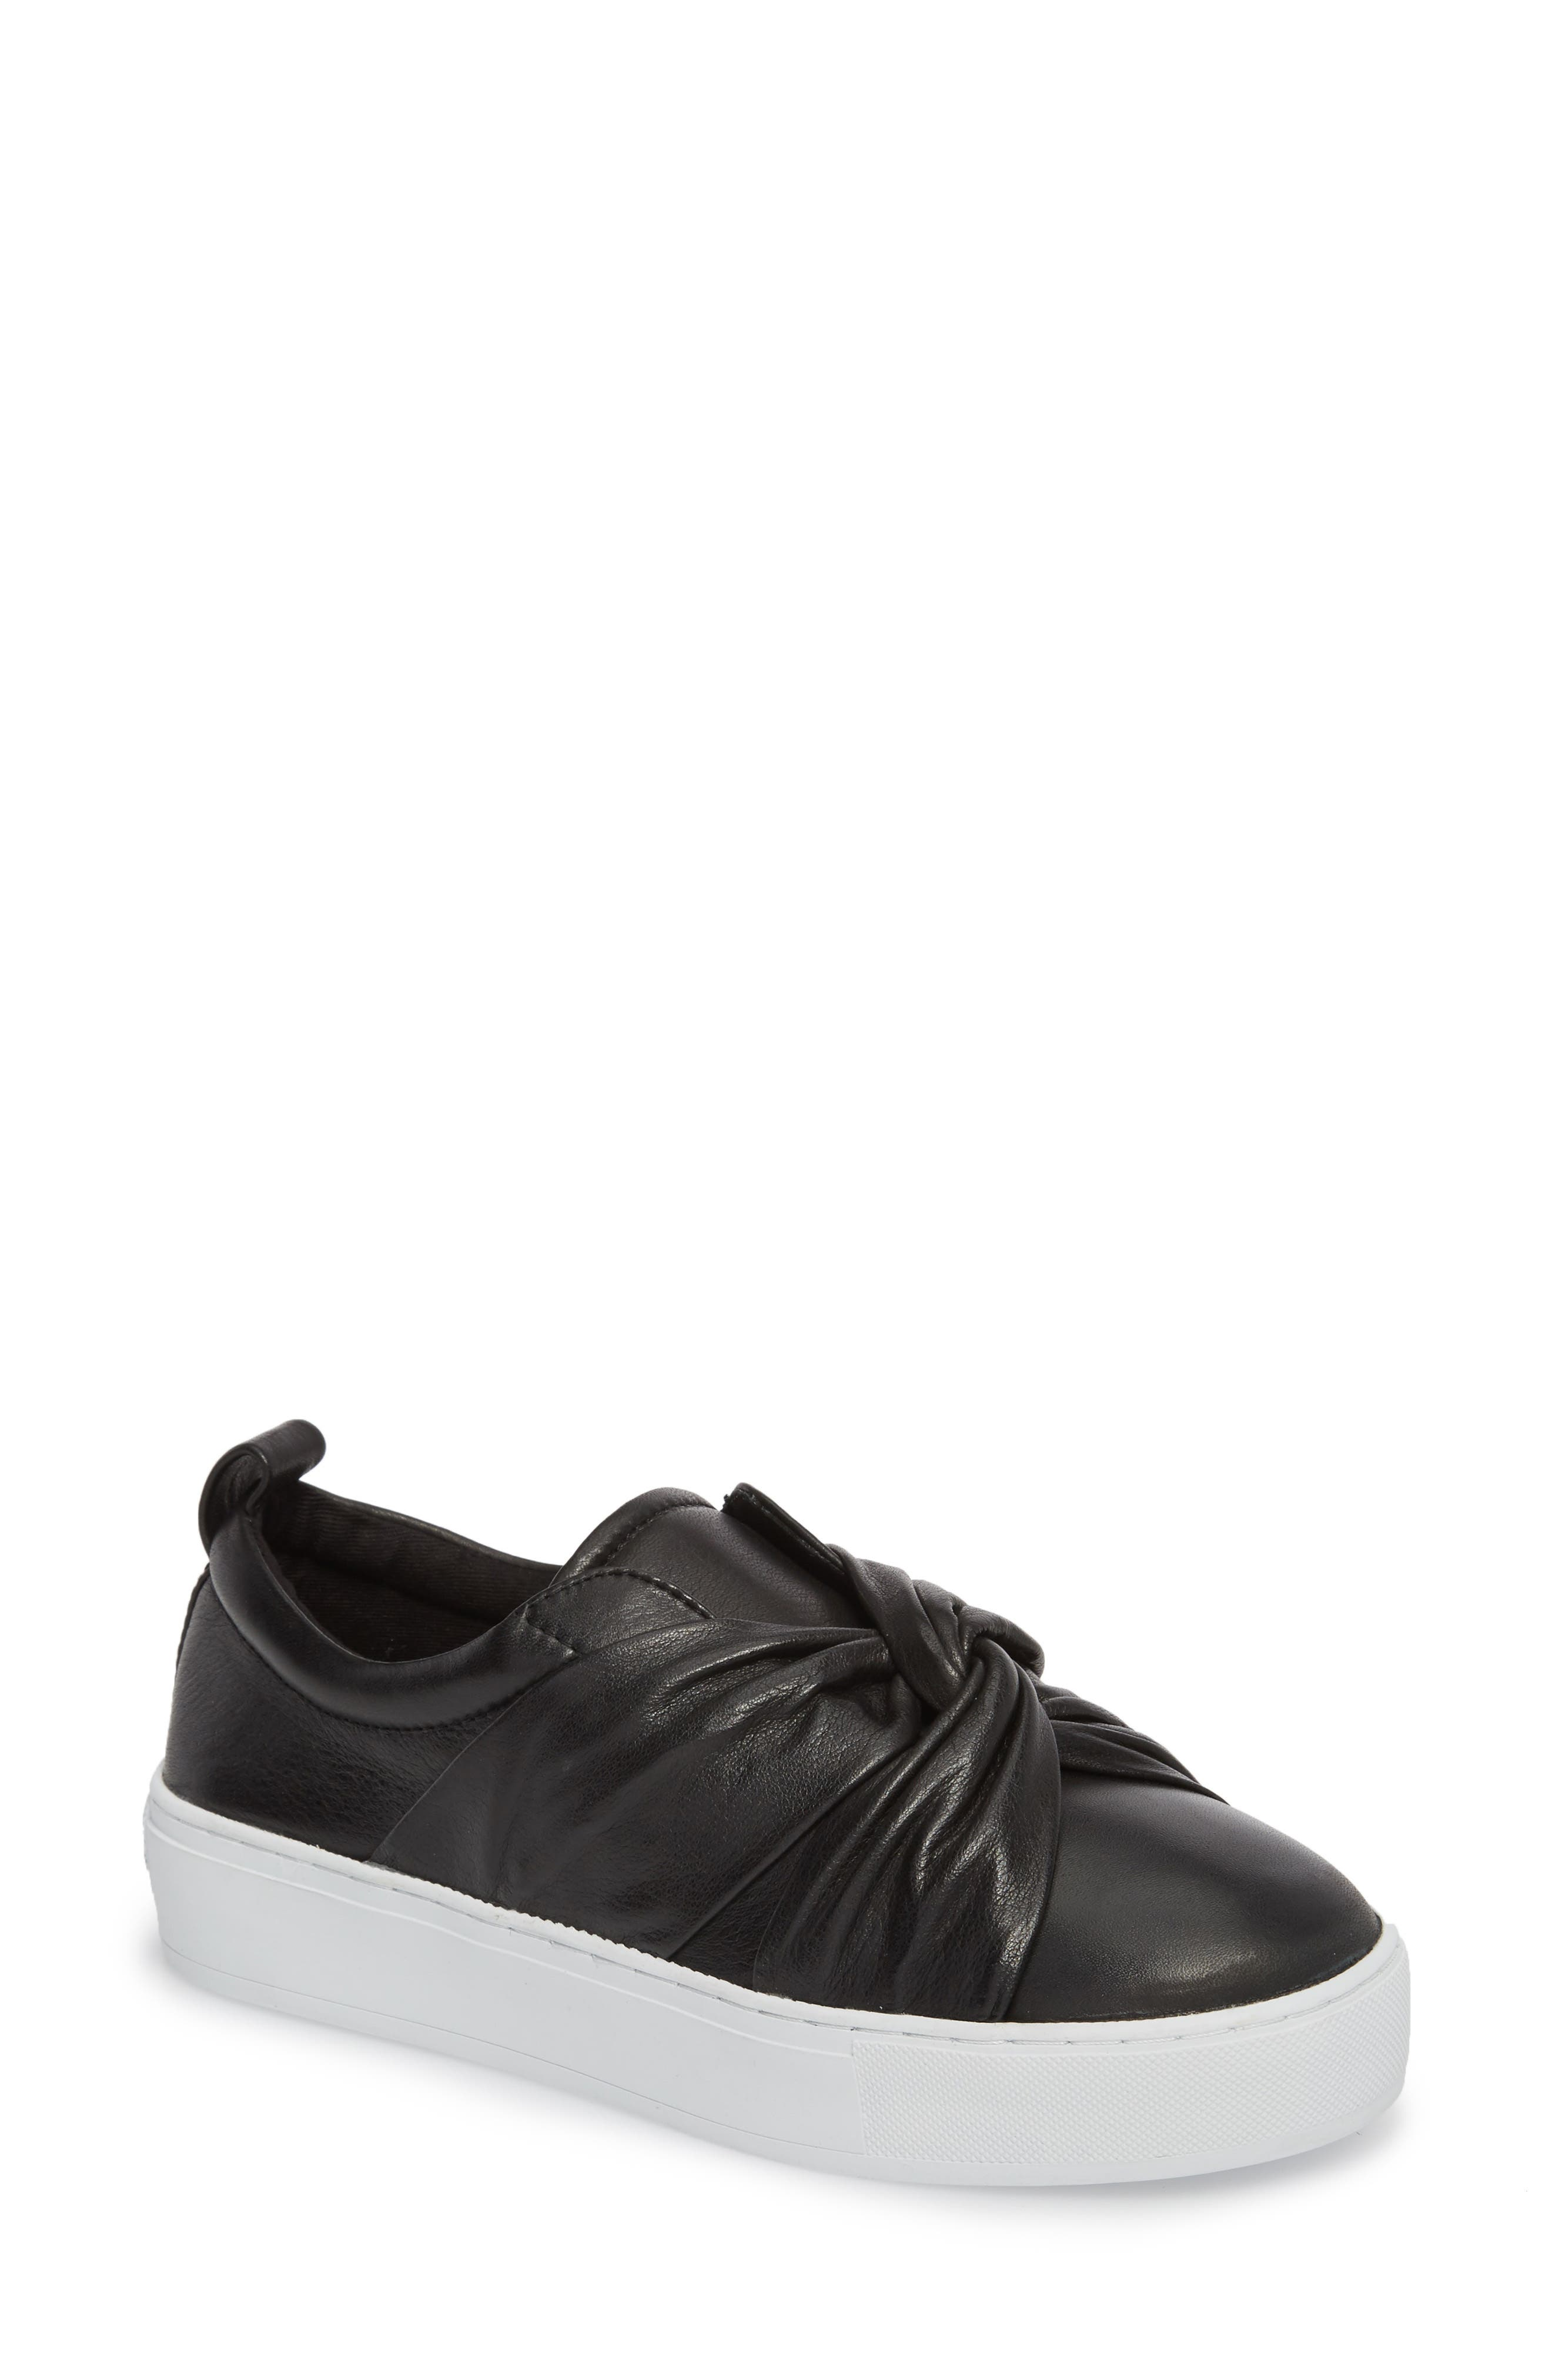 Nicole Platform Sneaker,                             Main thumbnail 1, color,                             001